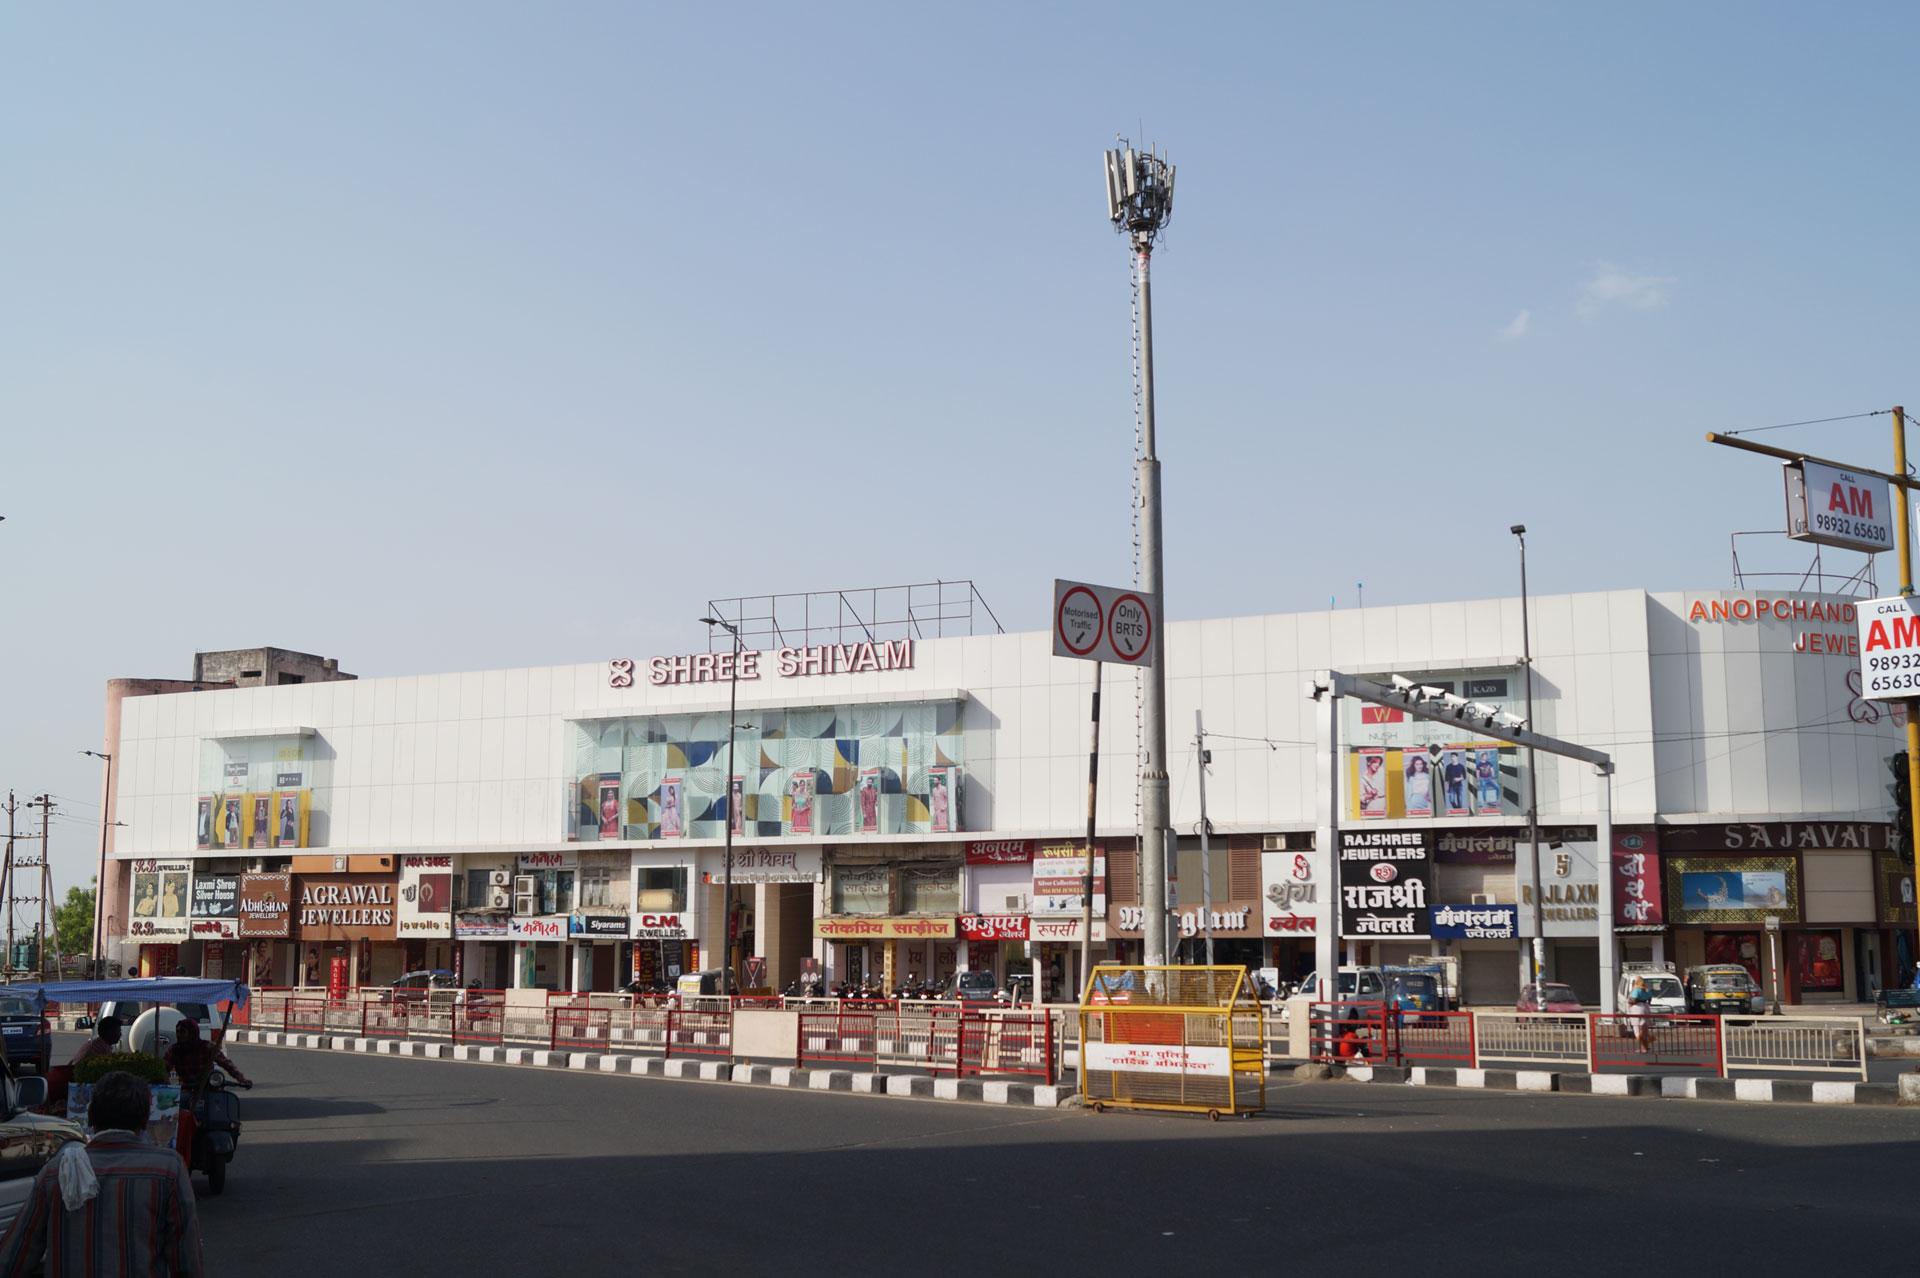 Shri Shivam Mall Bhopal